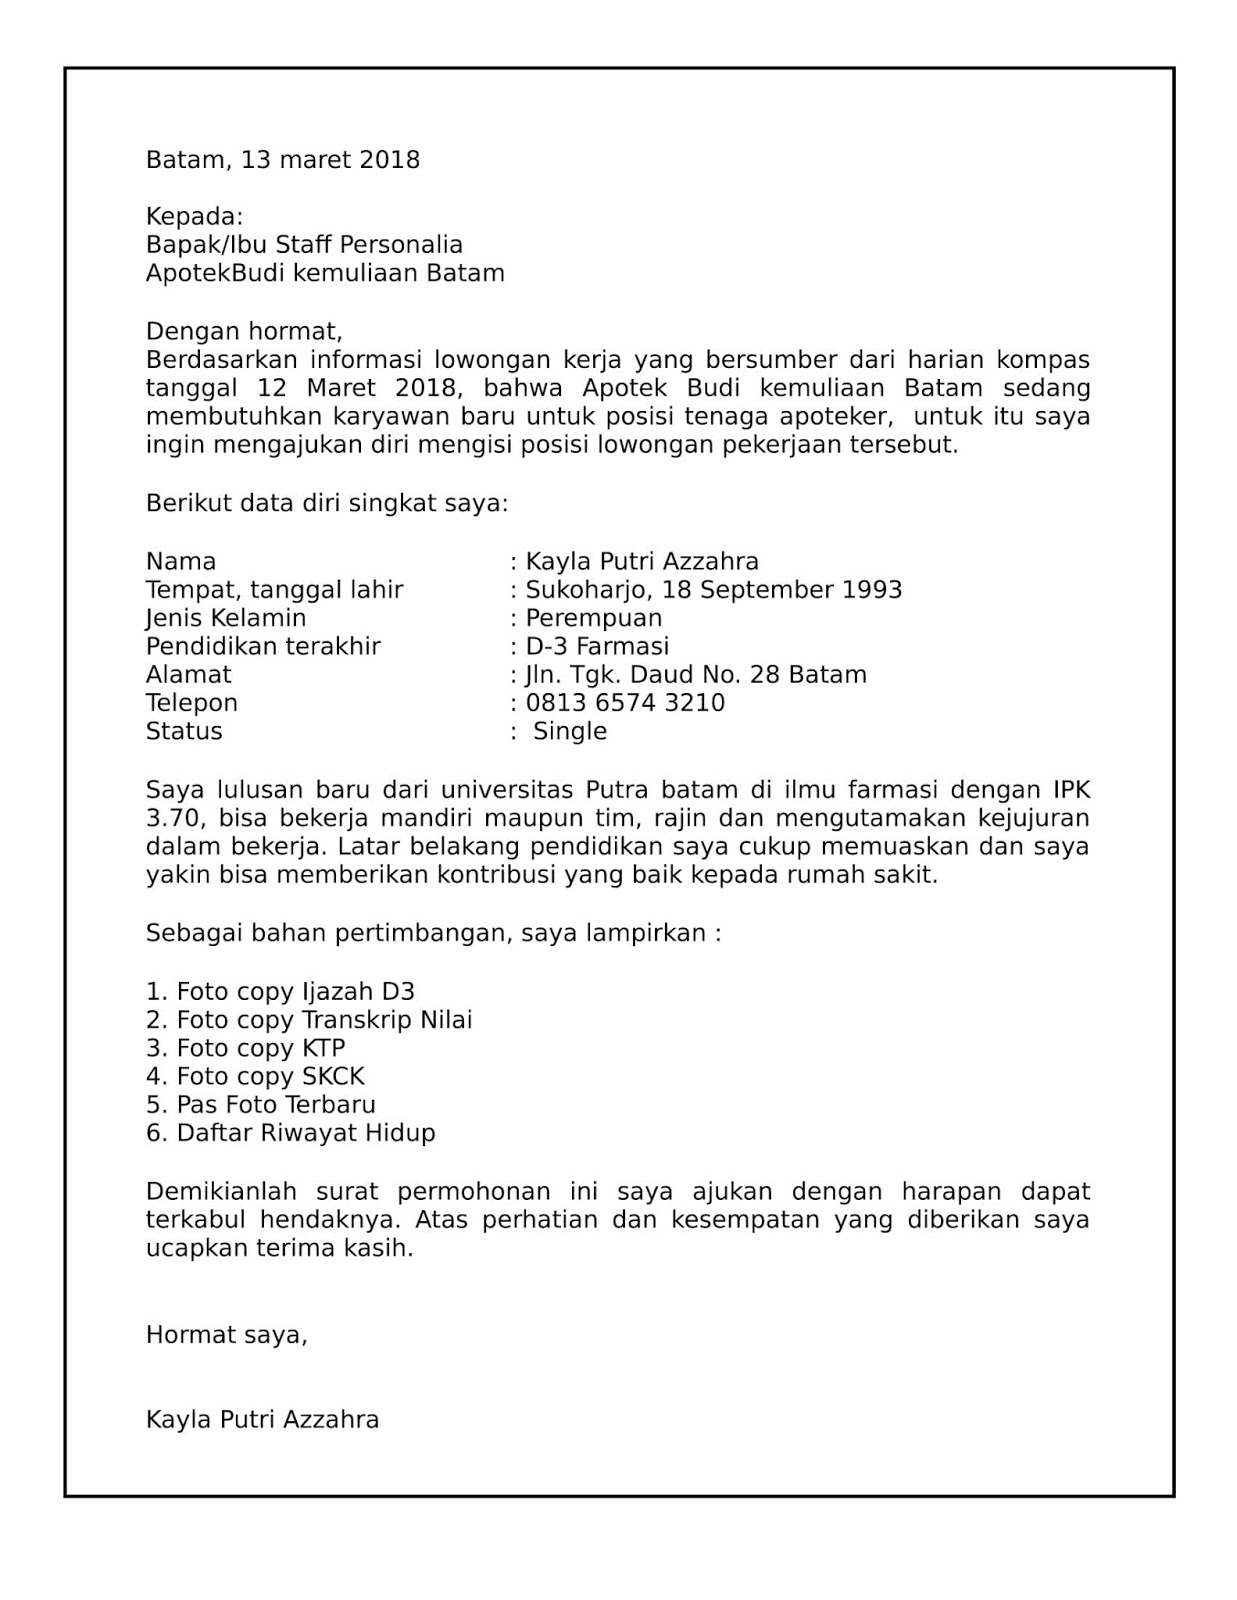 Contoh Surat Lamaran Kerja Apoteker Terbaru Contoh Surat